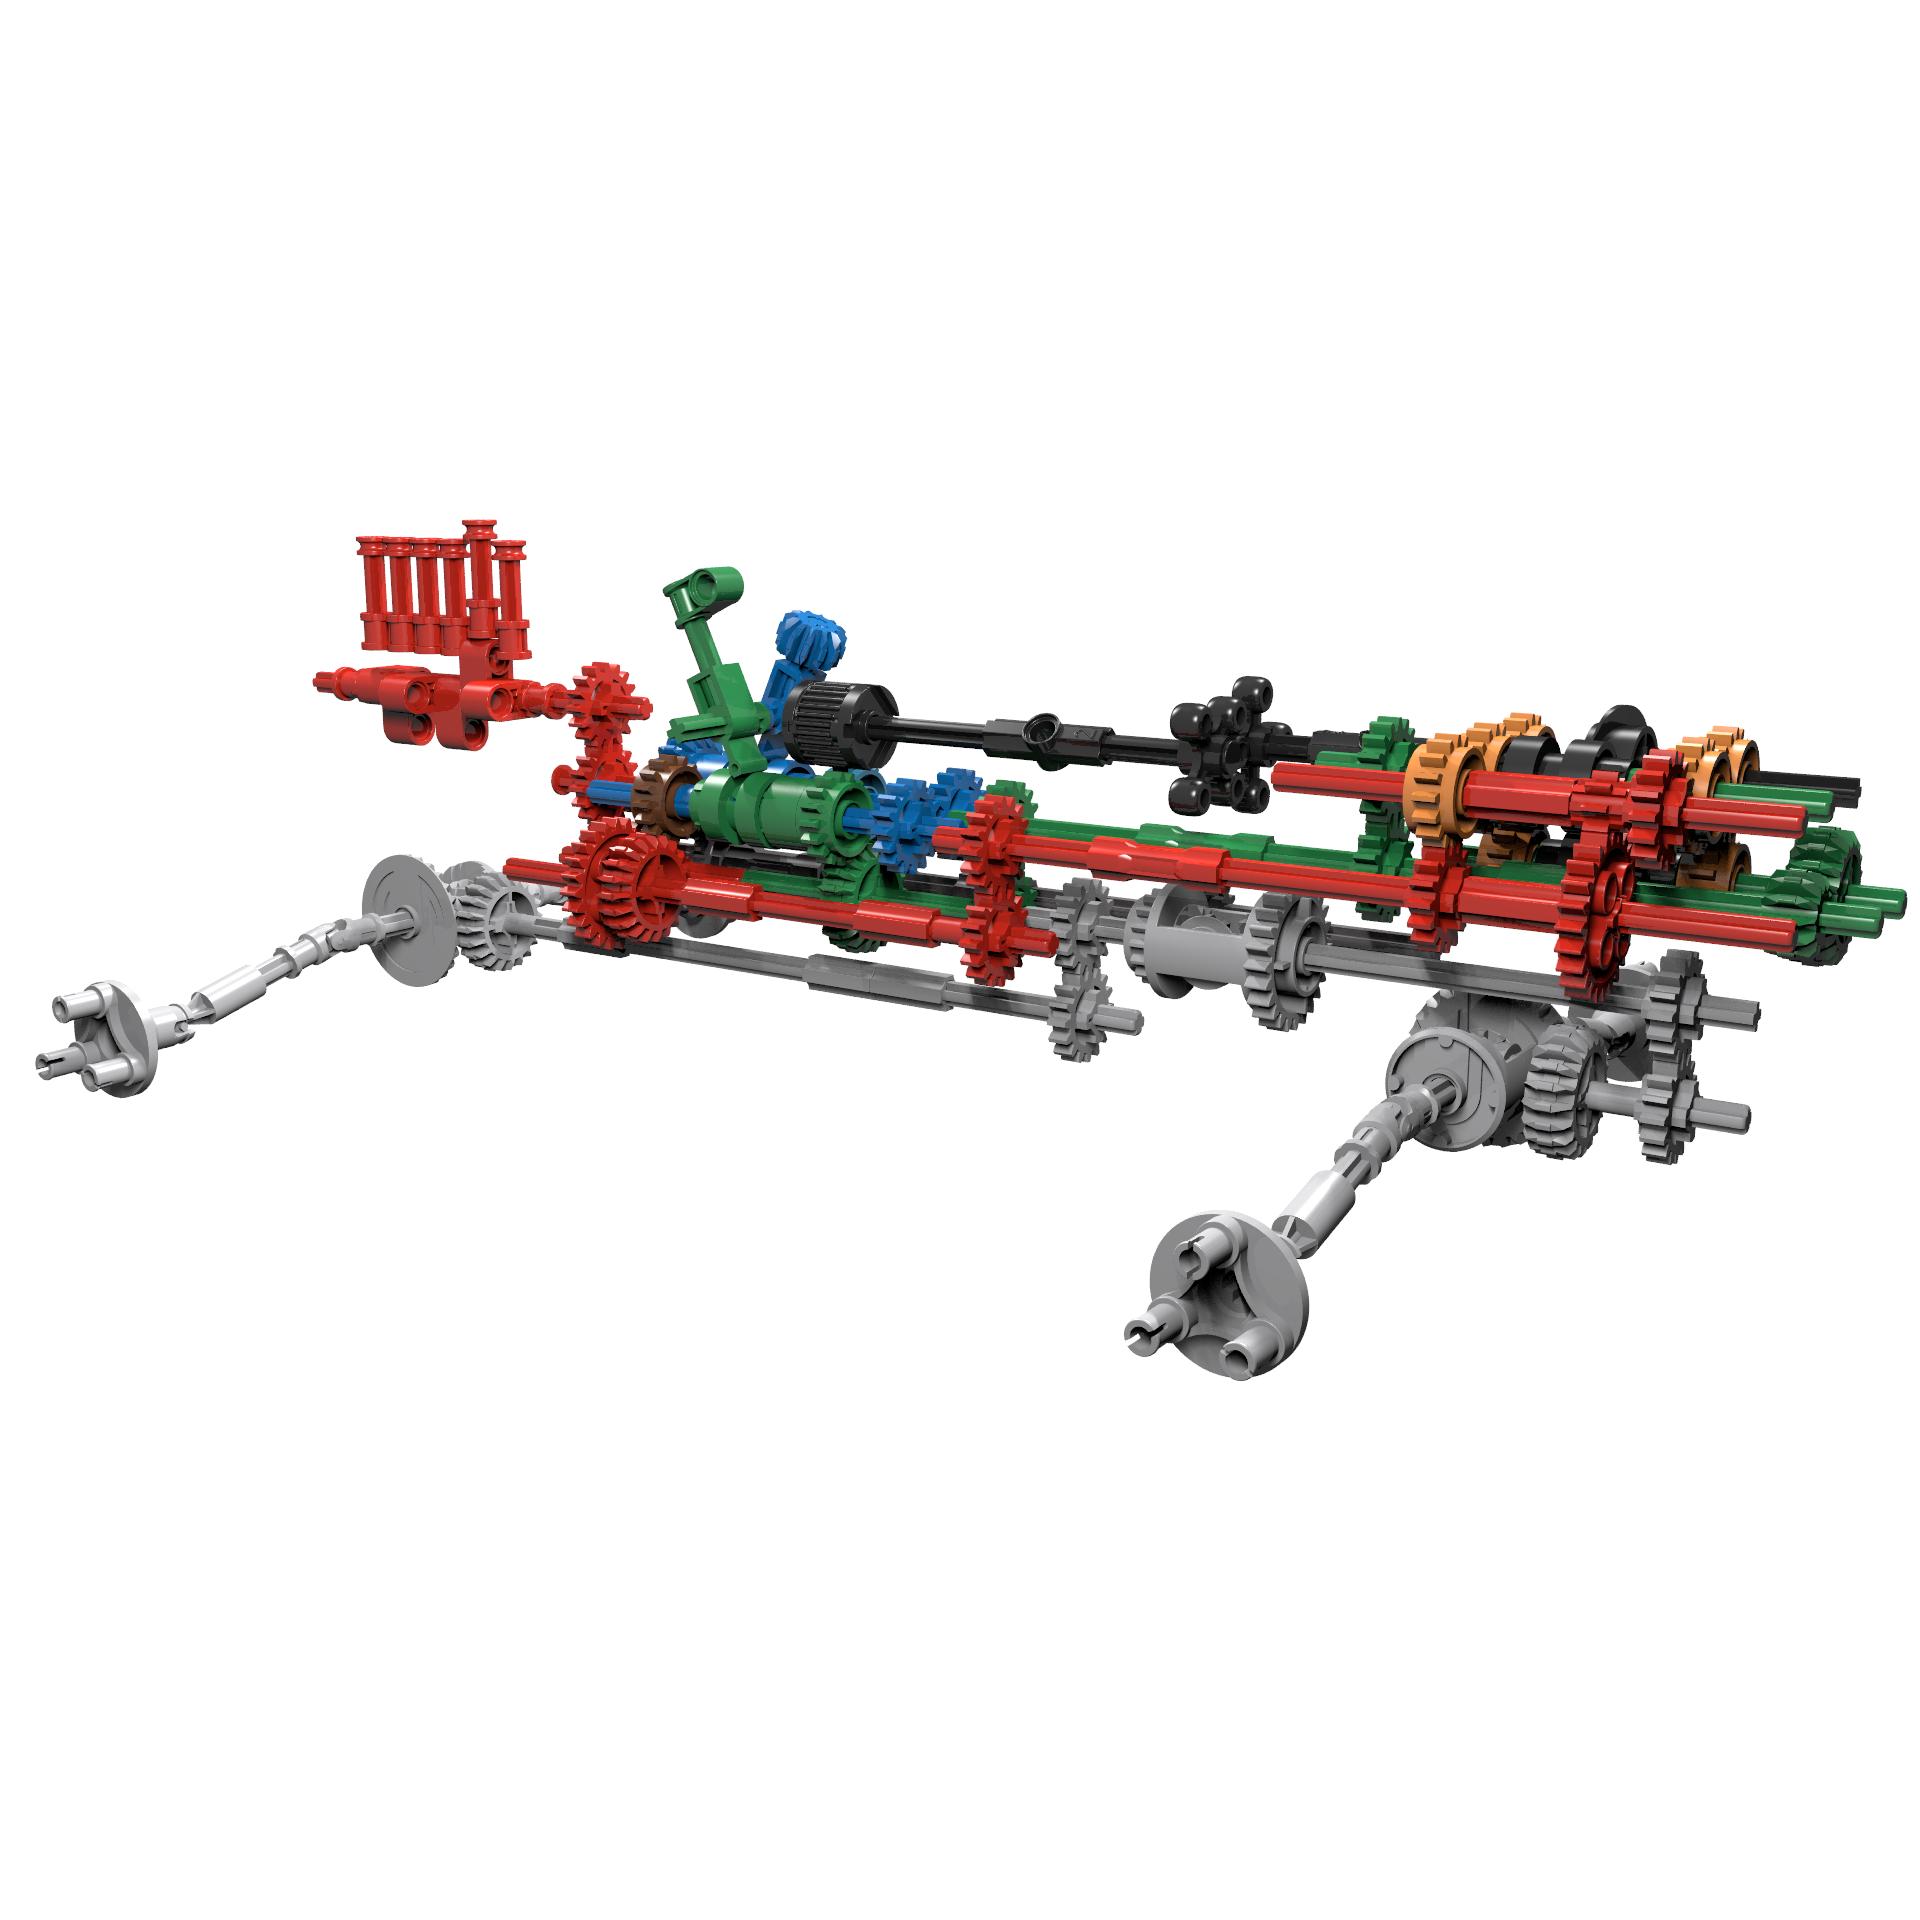 LEGO MOC-31299 42110 Pimp Up My Land Rover (Technic 2019